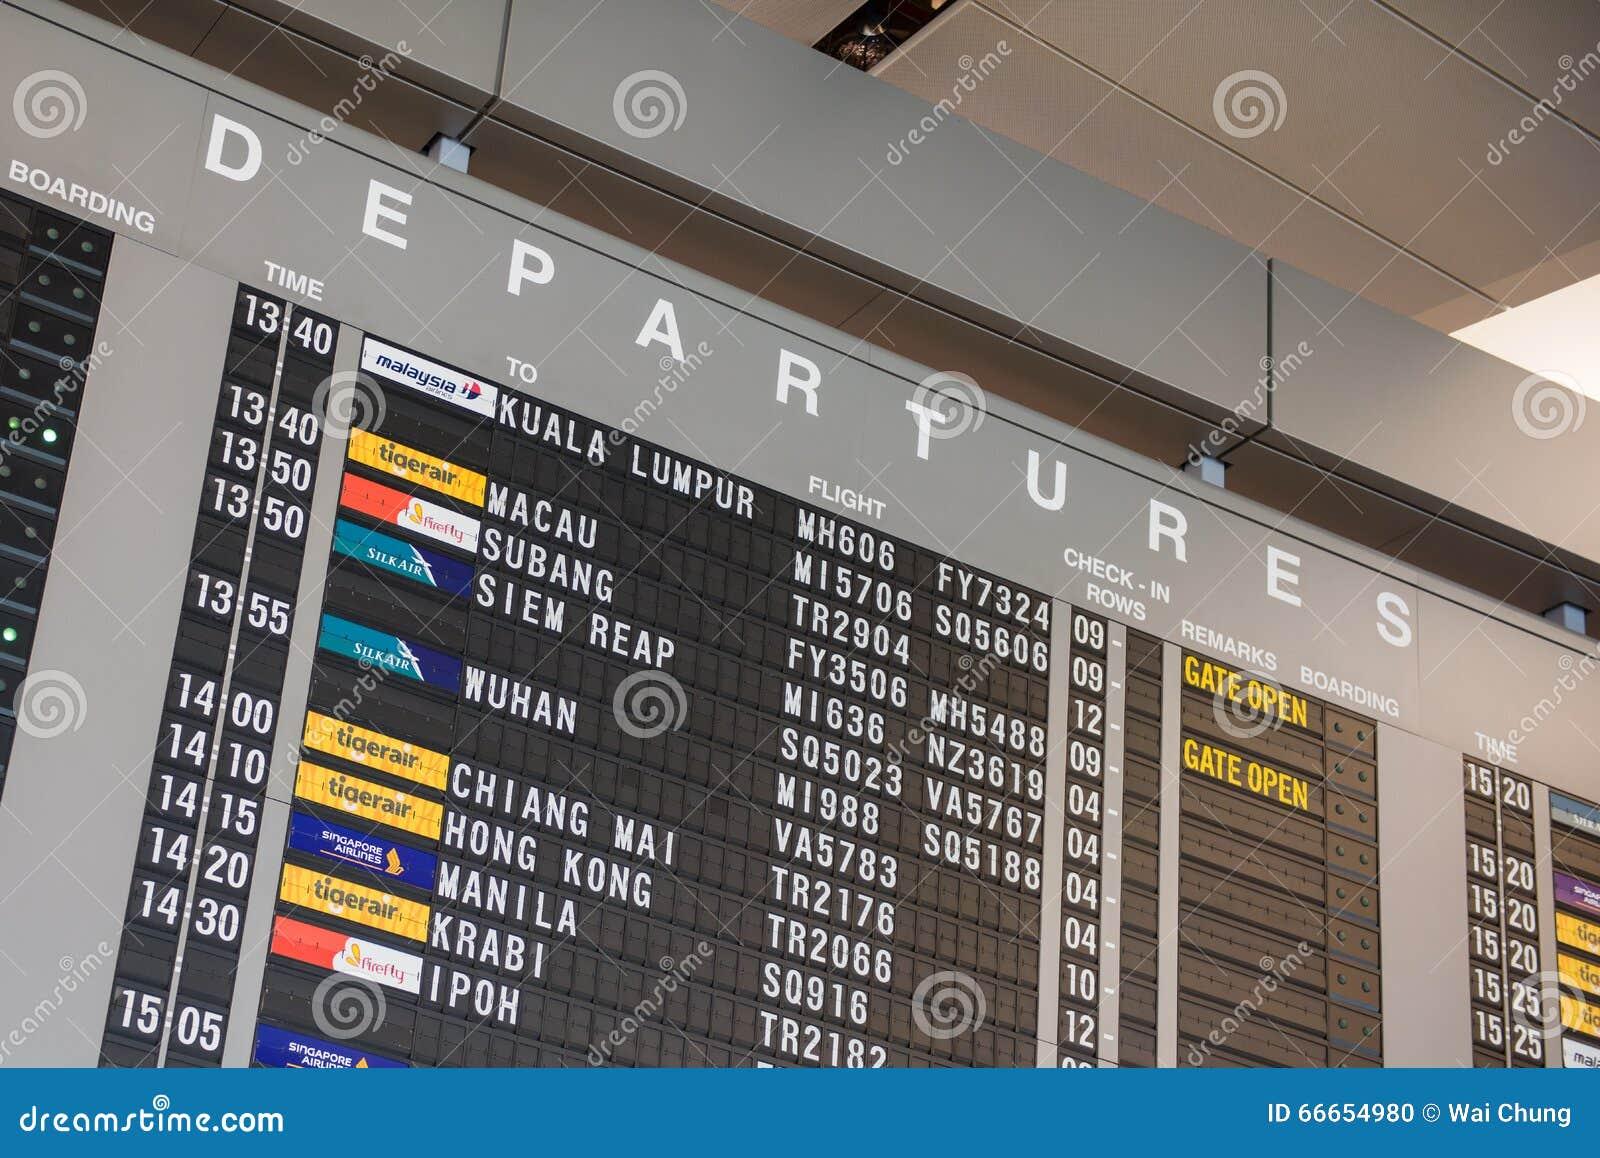 changi airport flight schedule